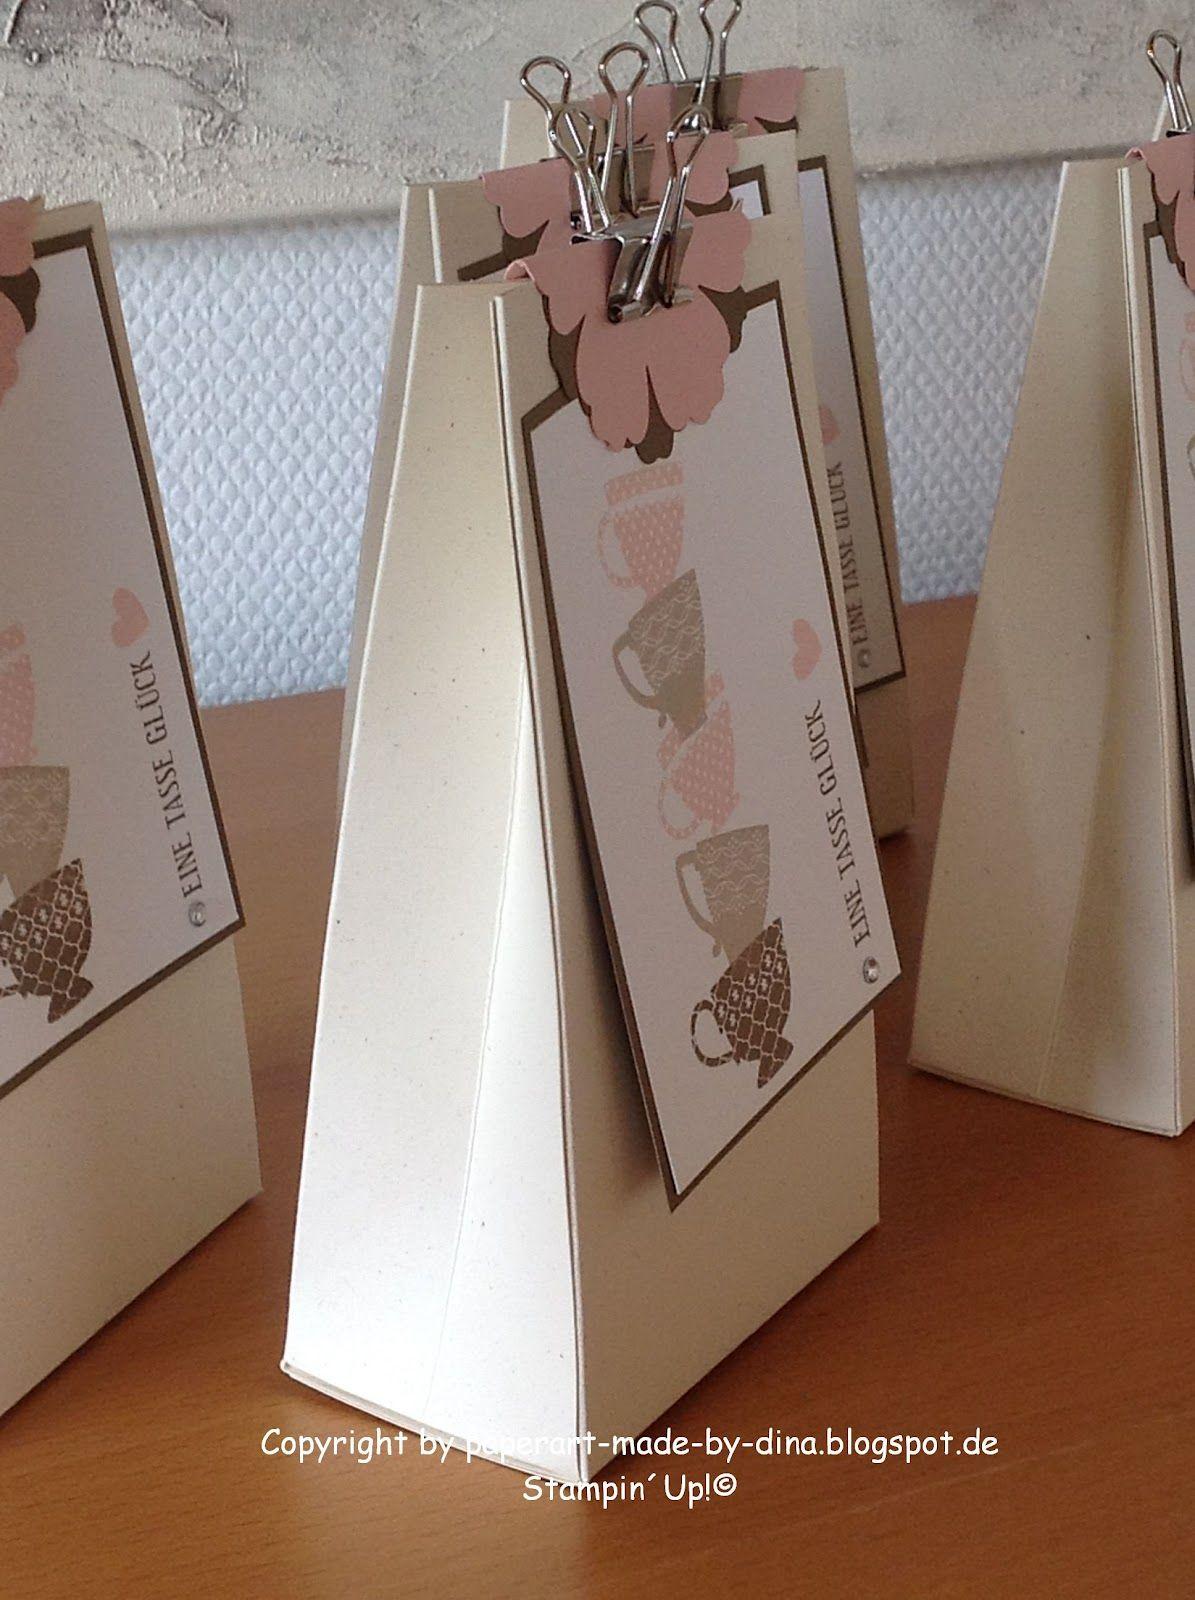 sch nes aus papier handgemacht t te mit anleitung anleitungen in 2018 pinterest t te. Black Bedroom Furniture Sets. Home Design Ideas